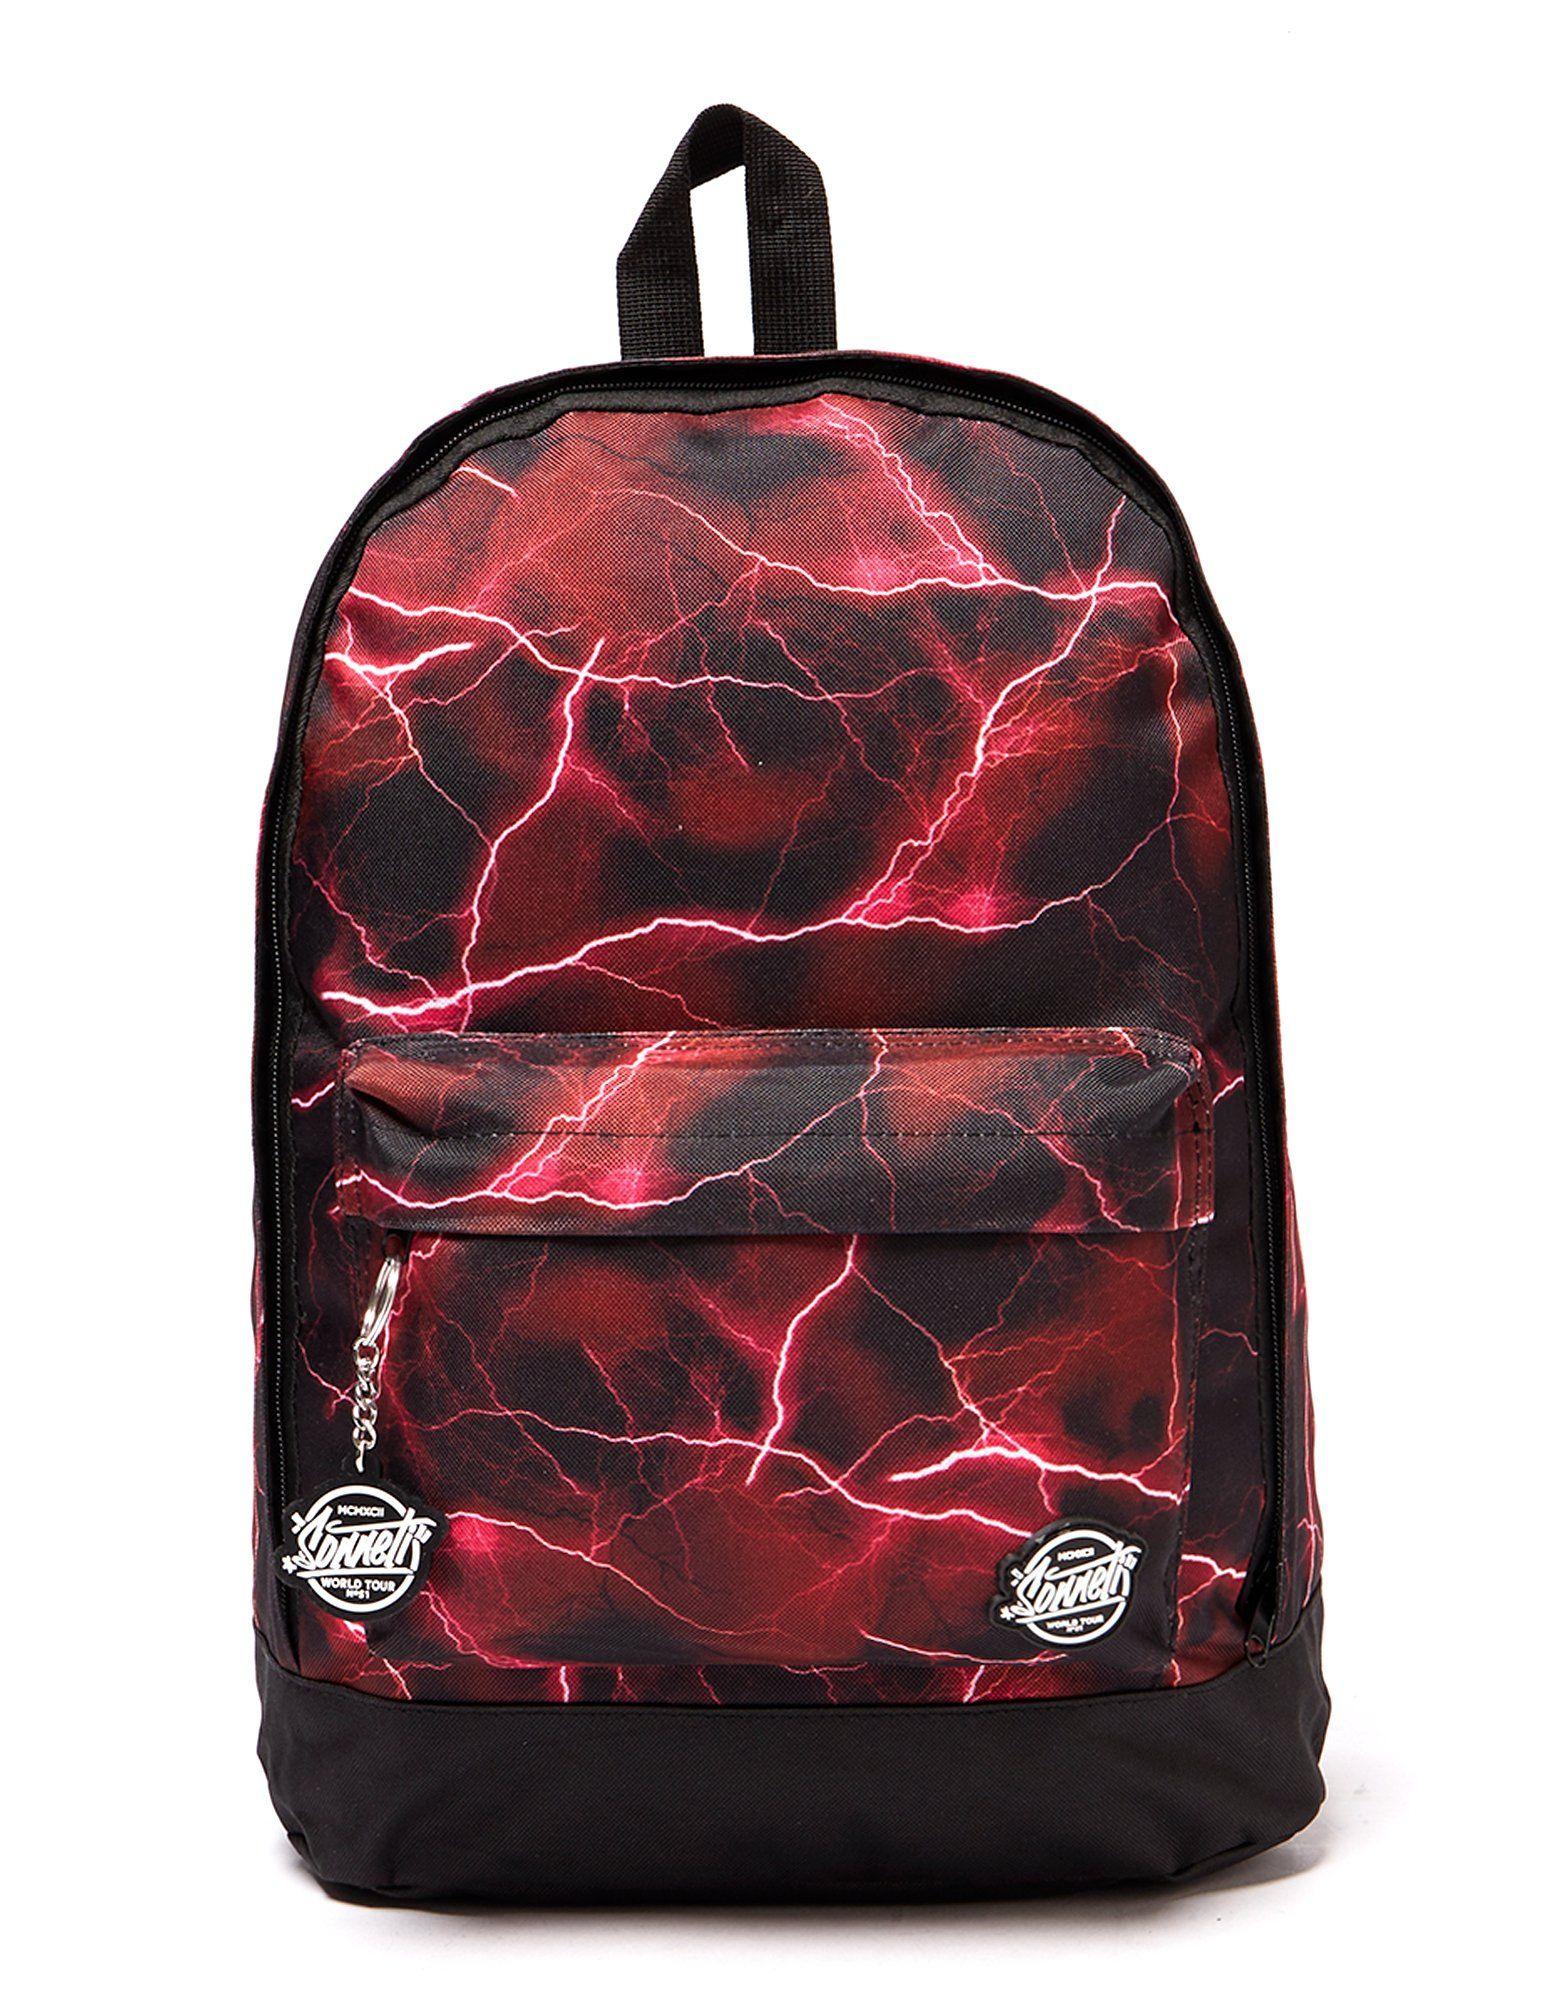 Leather gloves mens jd - Sonneti Bolt Backpack